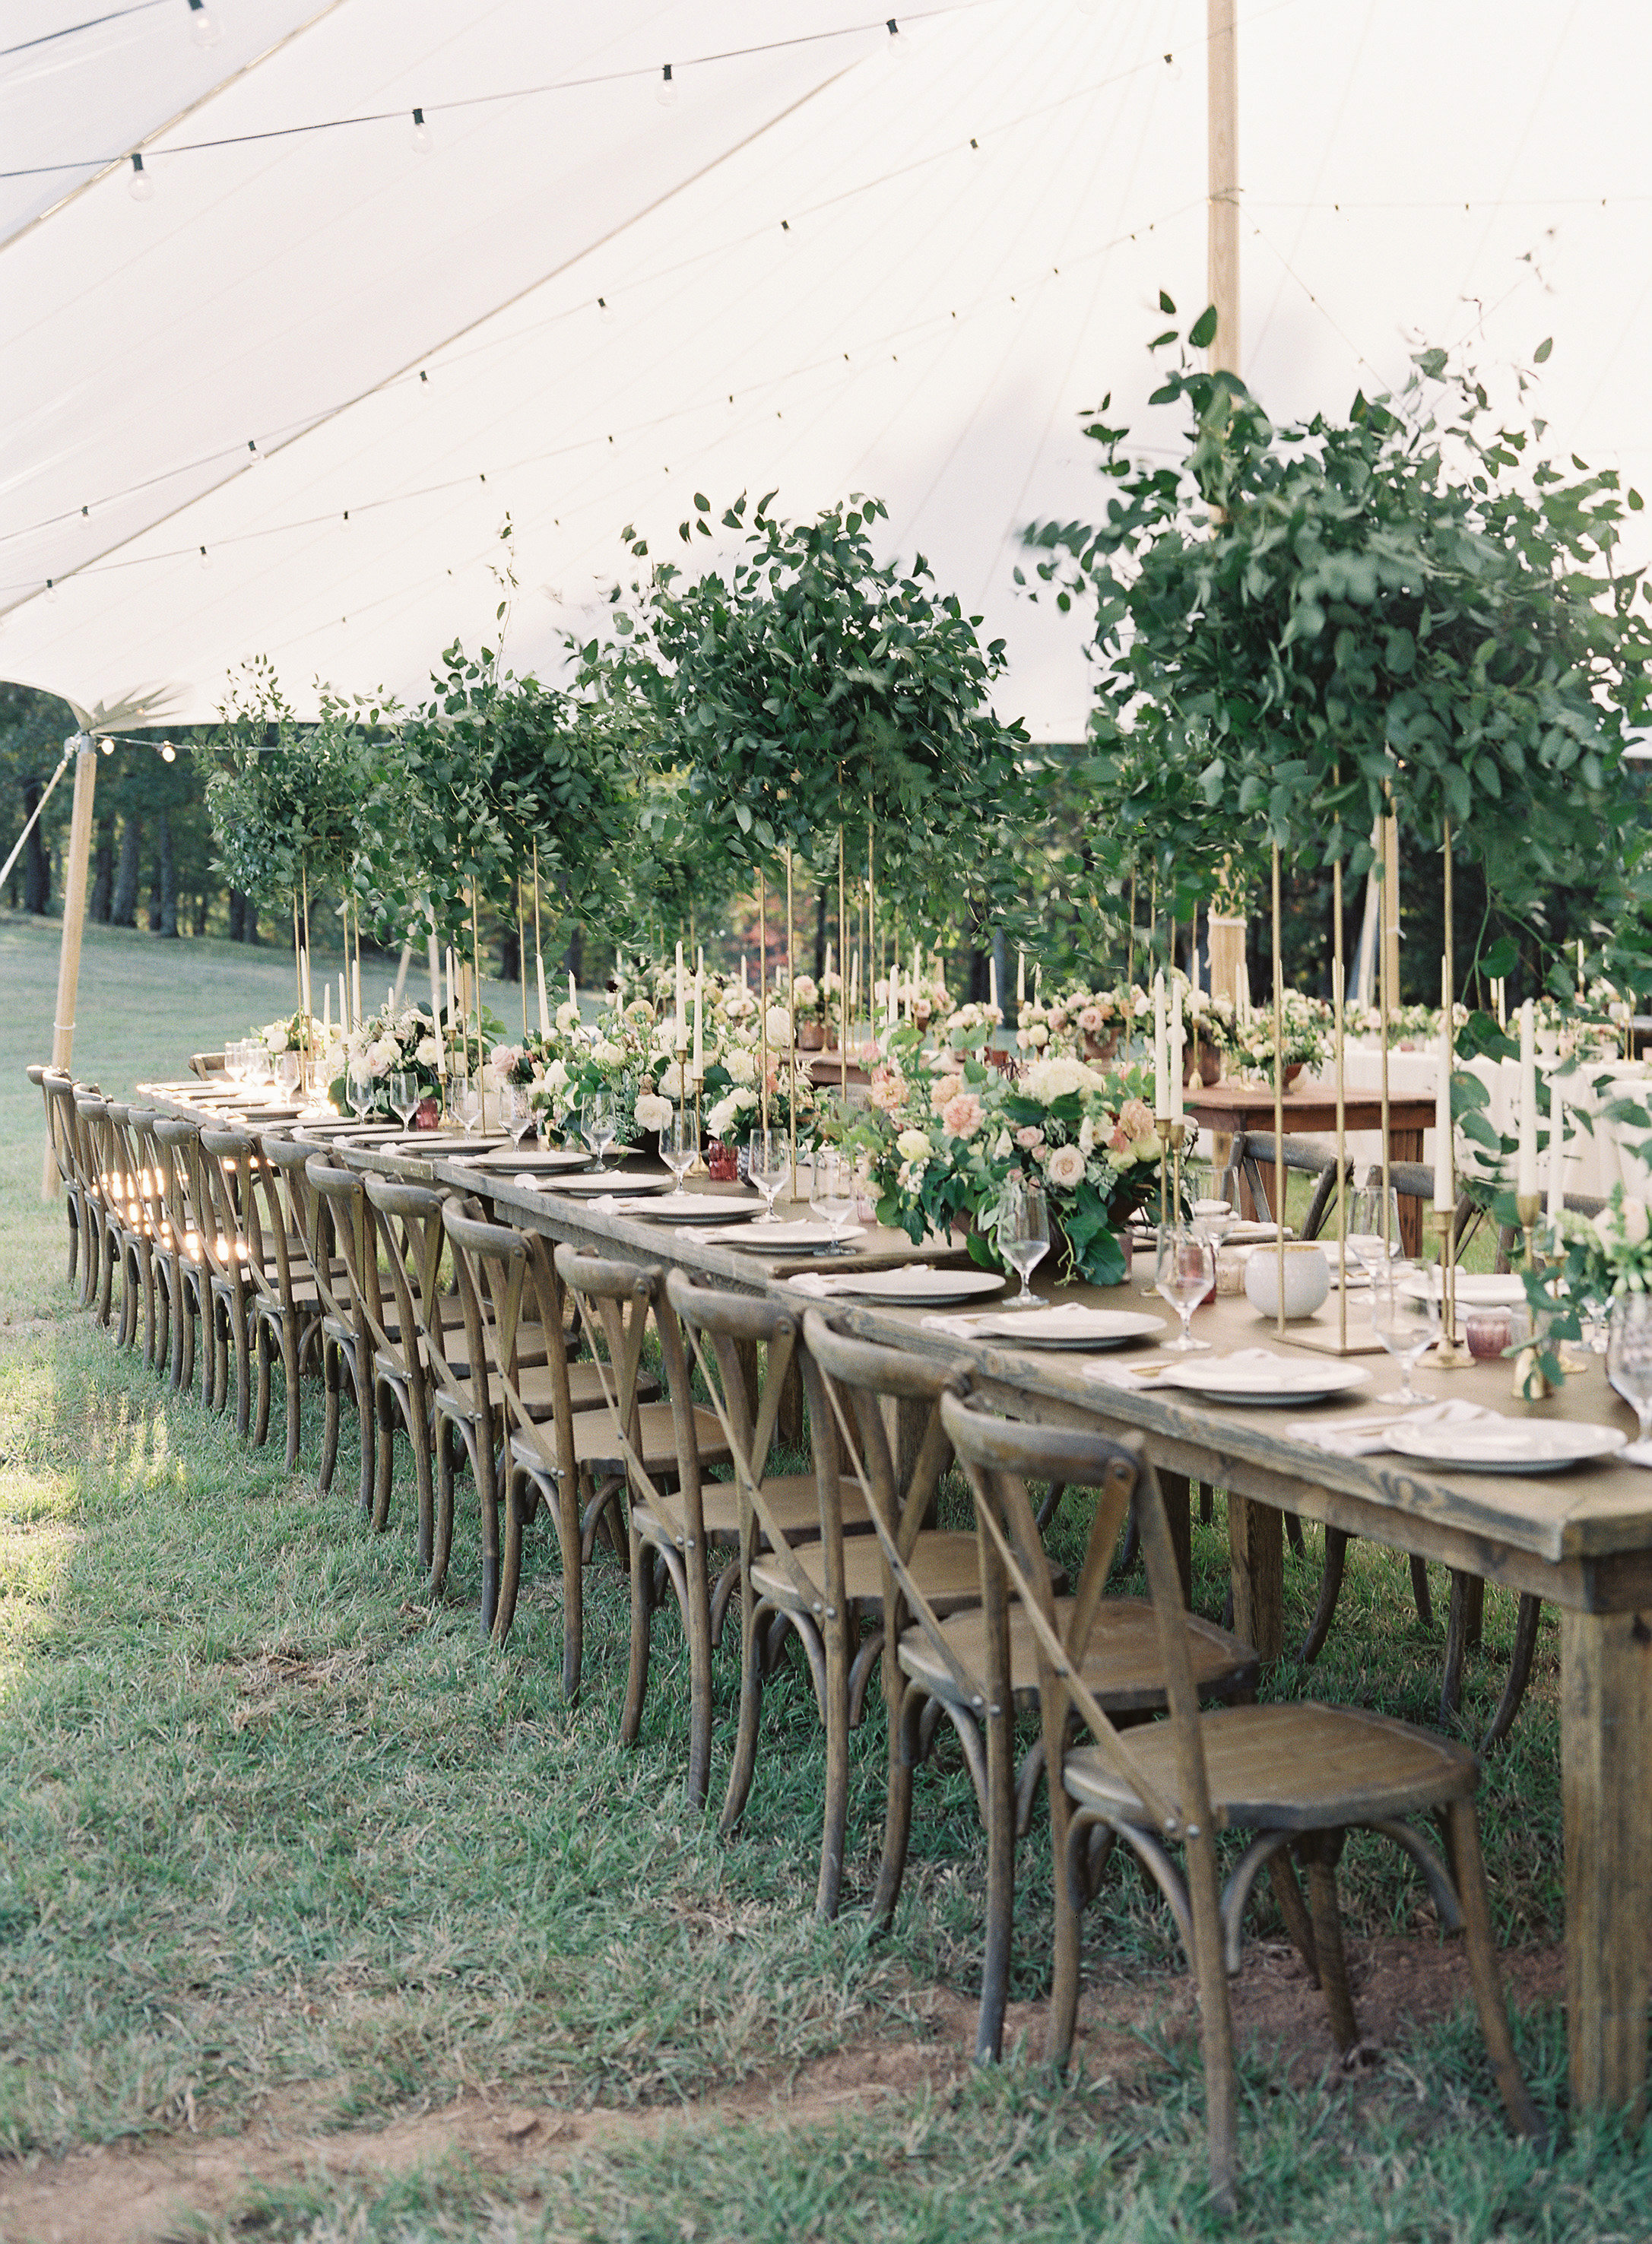 jessica-zimmerman-events-shay-mooney-wedding-reception.jpg